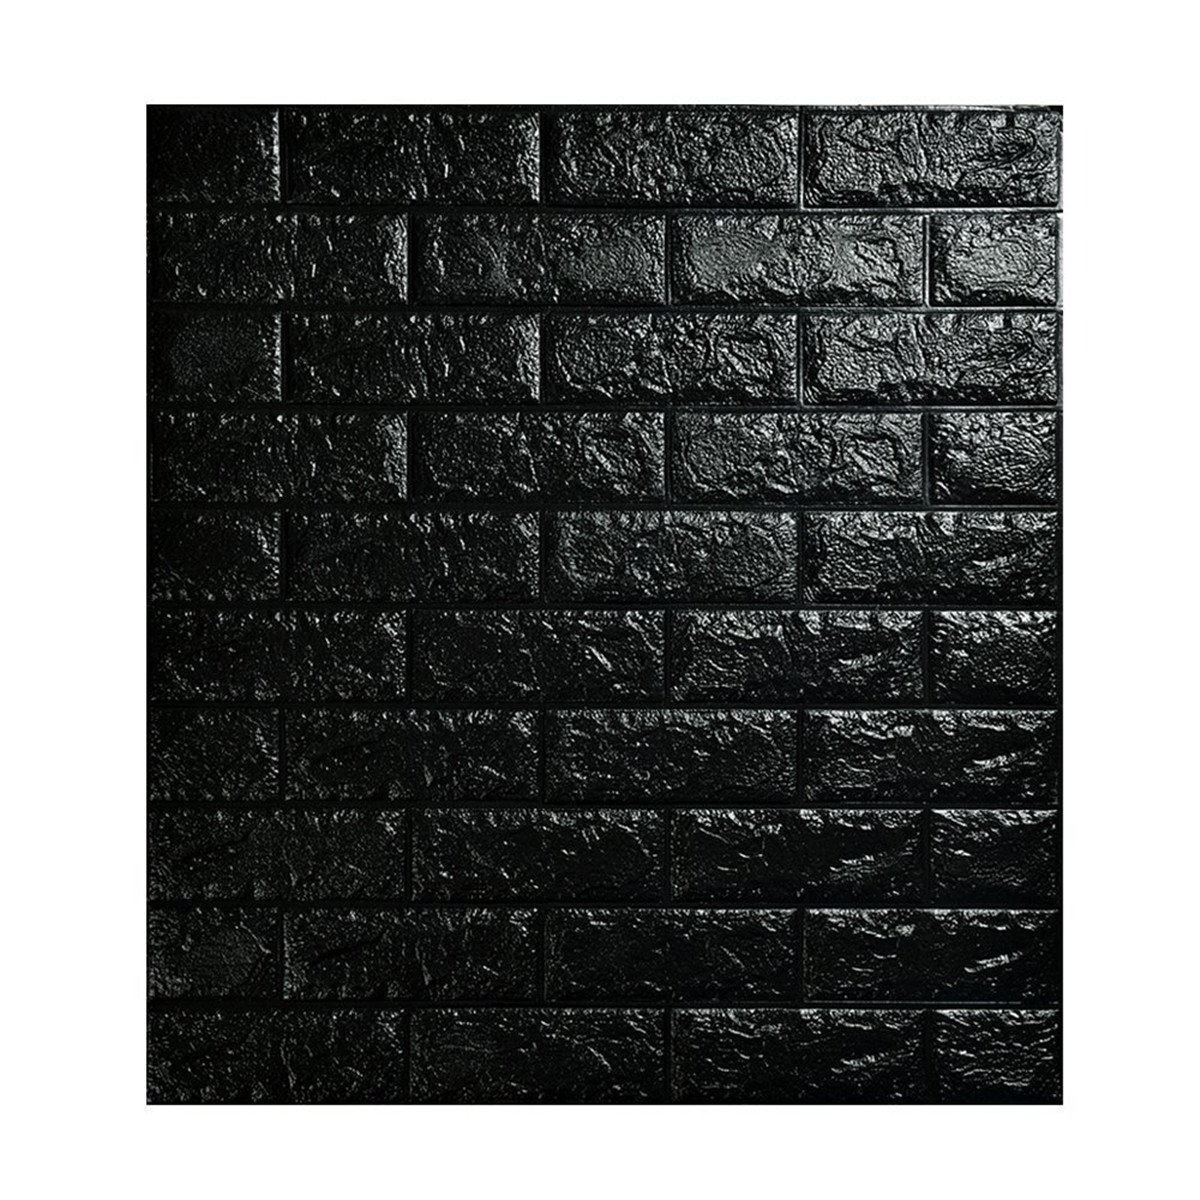 MECCION 3D立体壁紙 DIYレンガ調壁紙シール 70x77CM ウォールステッカー 軽量レンガシール 壁紙シール 自己粘着 防水 多色選択 (グリーン, 10枚入れ) B07D48ZPNR 10枚入れ|グリーン グリーン 10枚入れ